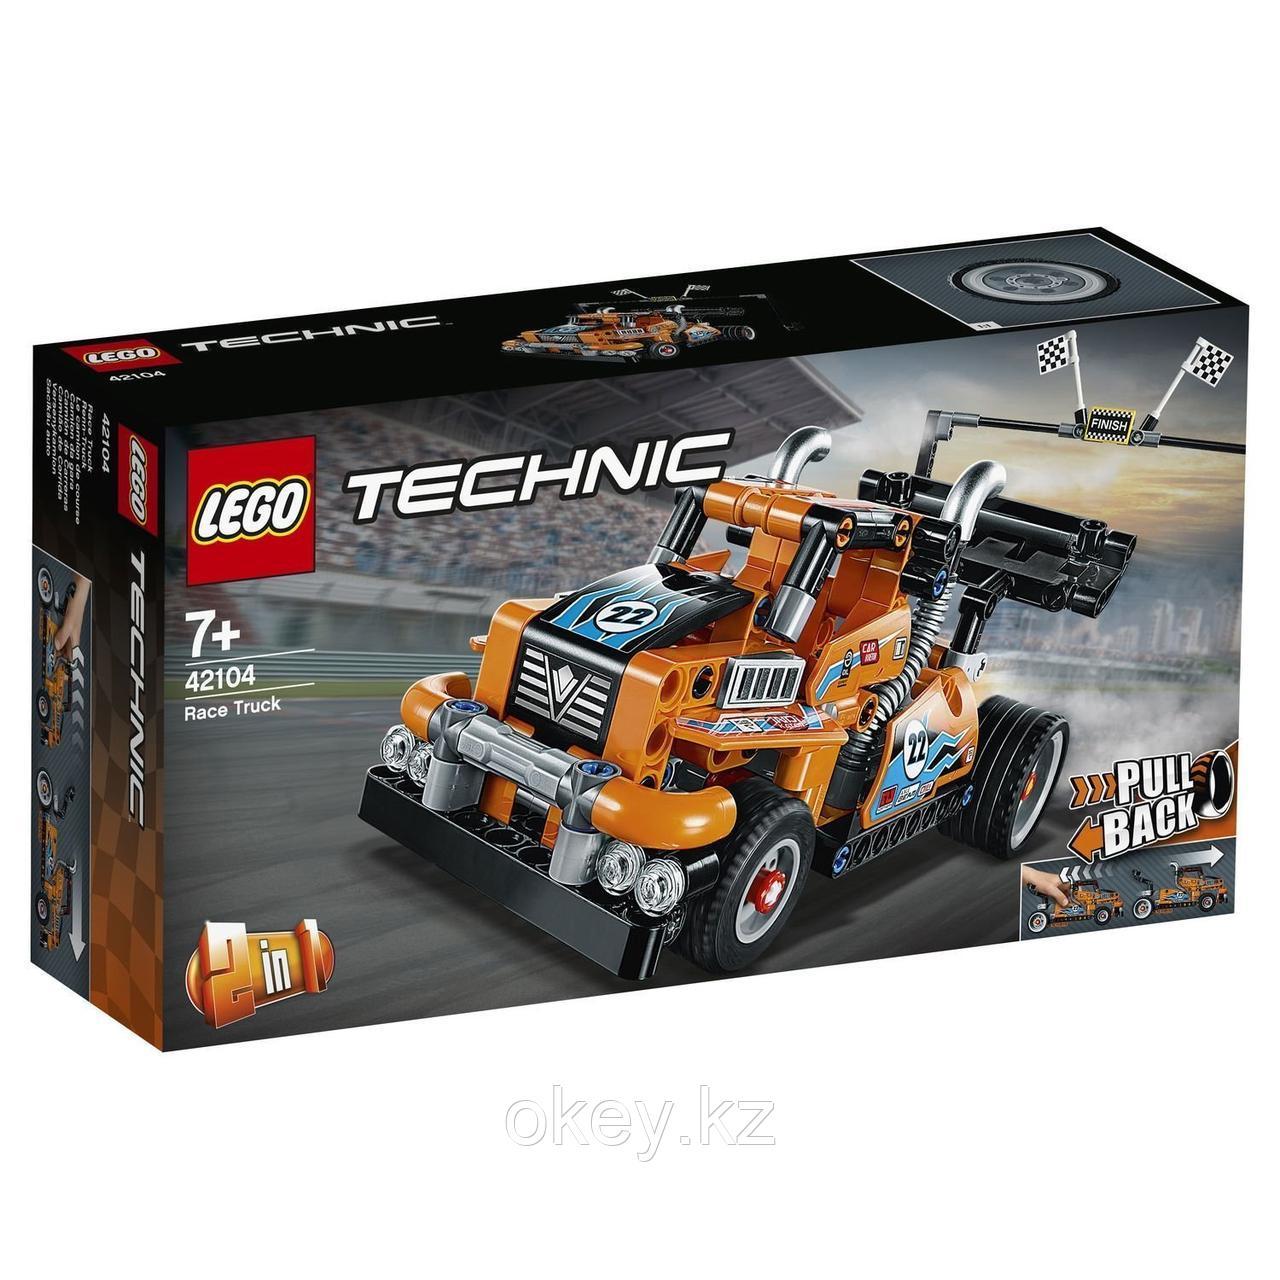 LEGO Technic: Гоночный грузовик 42104